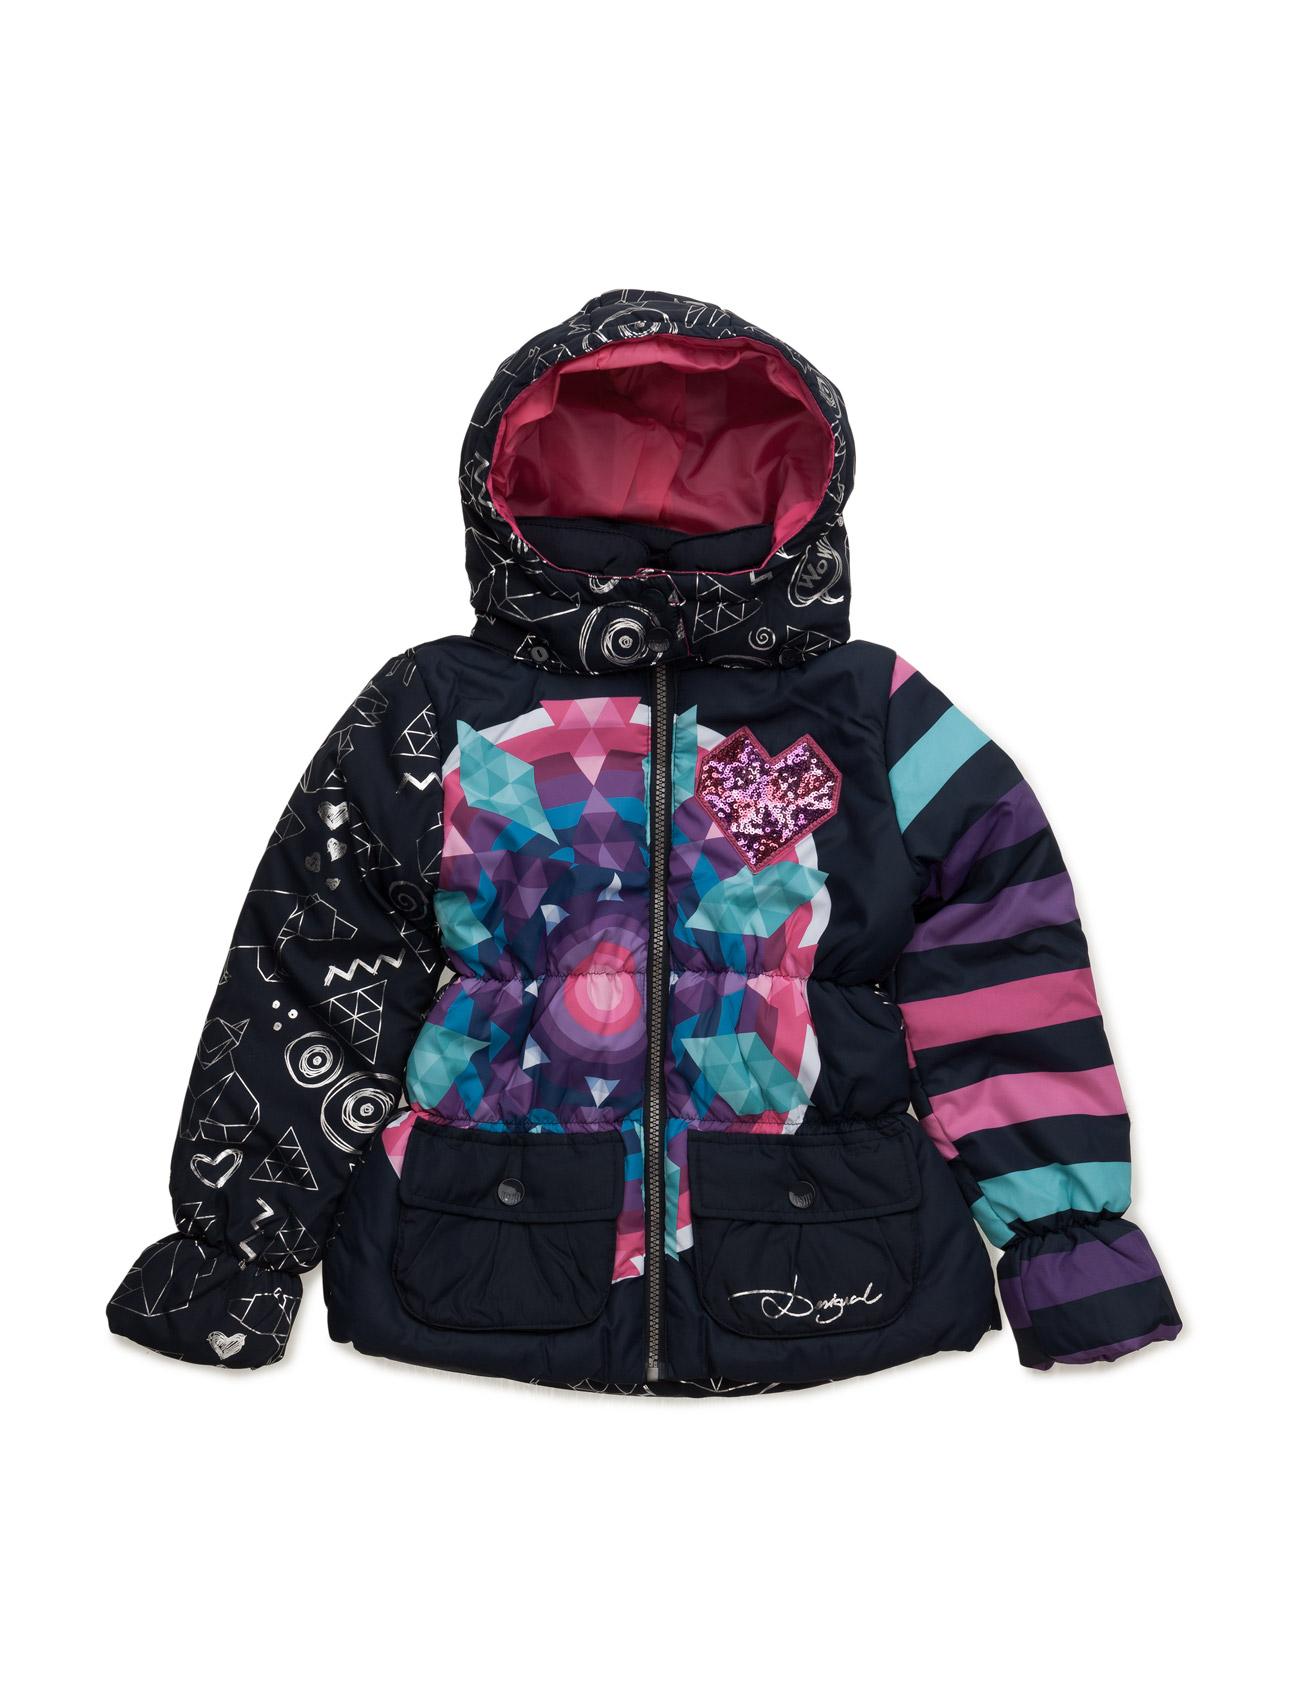 Abrig Grusoni Desigual Jackets & Coats